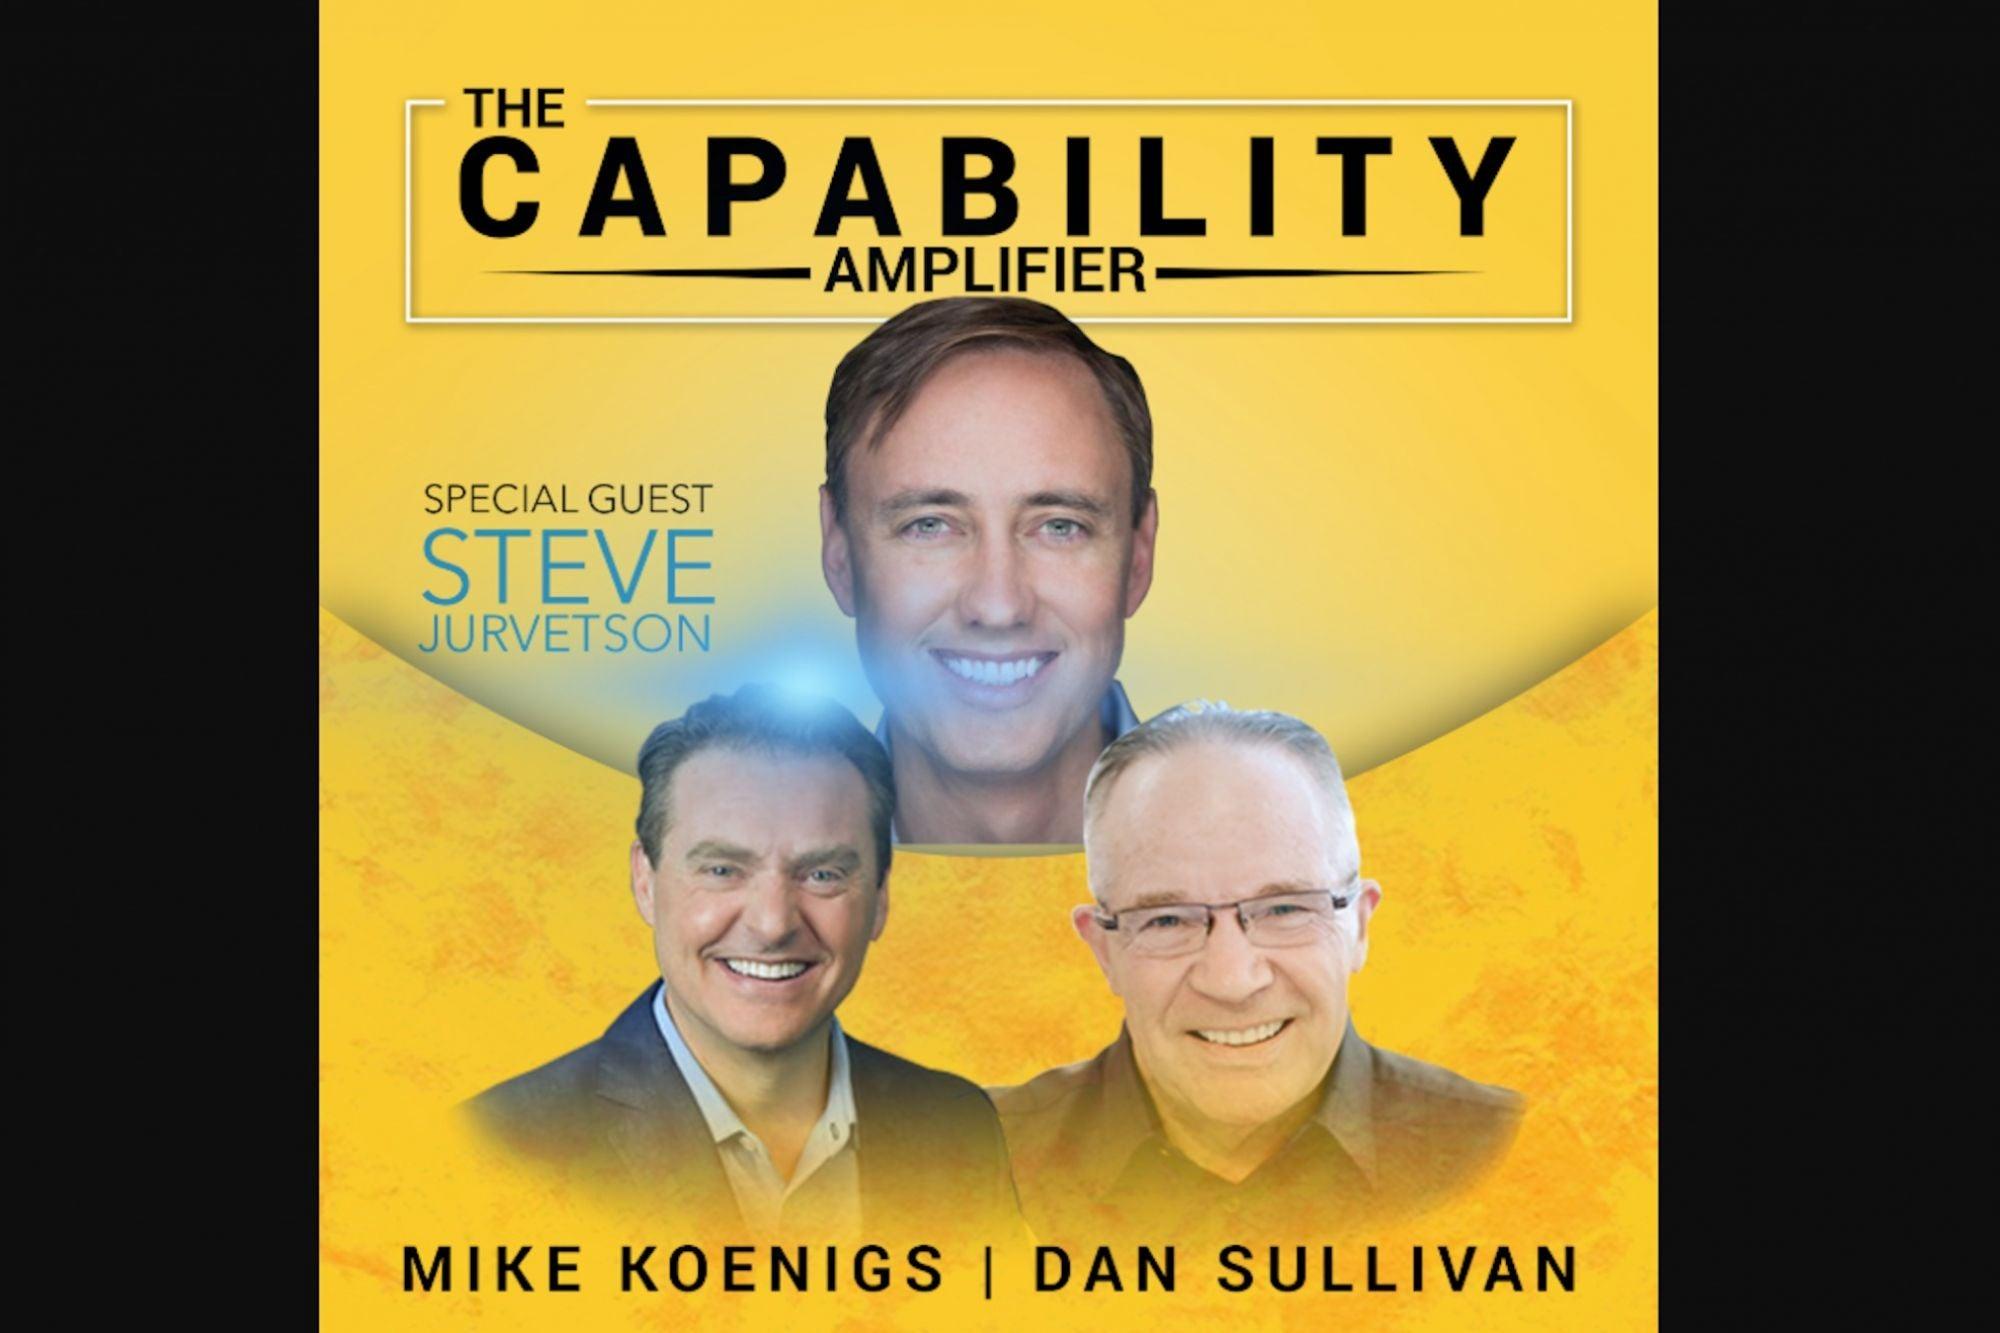 Geeking Out With Legendary Futurist and Investor Steve Jurvetson